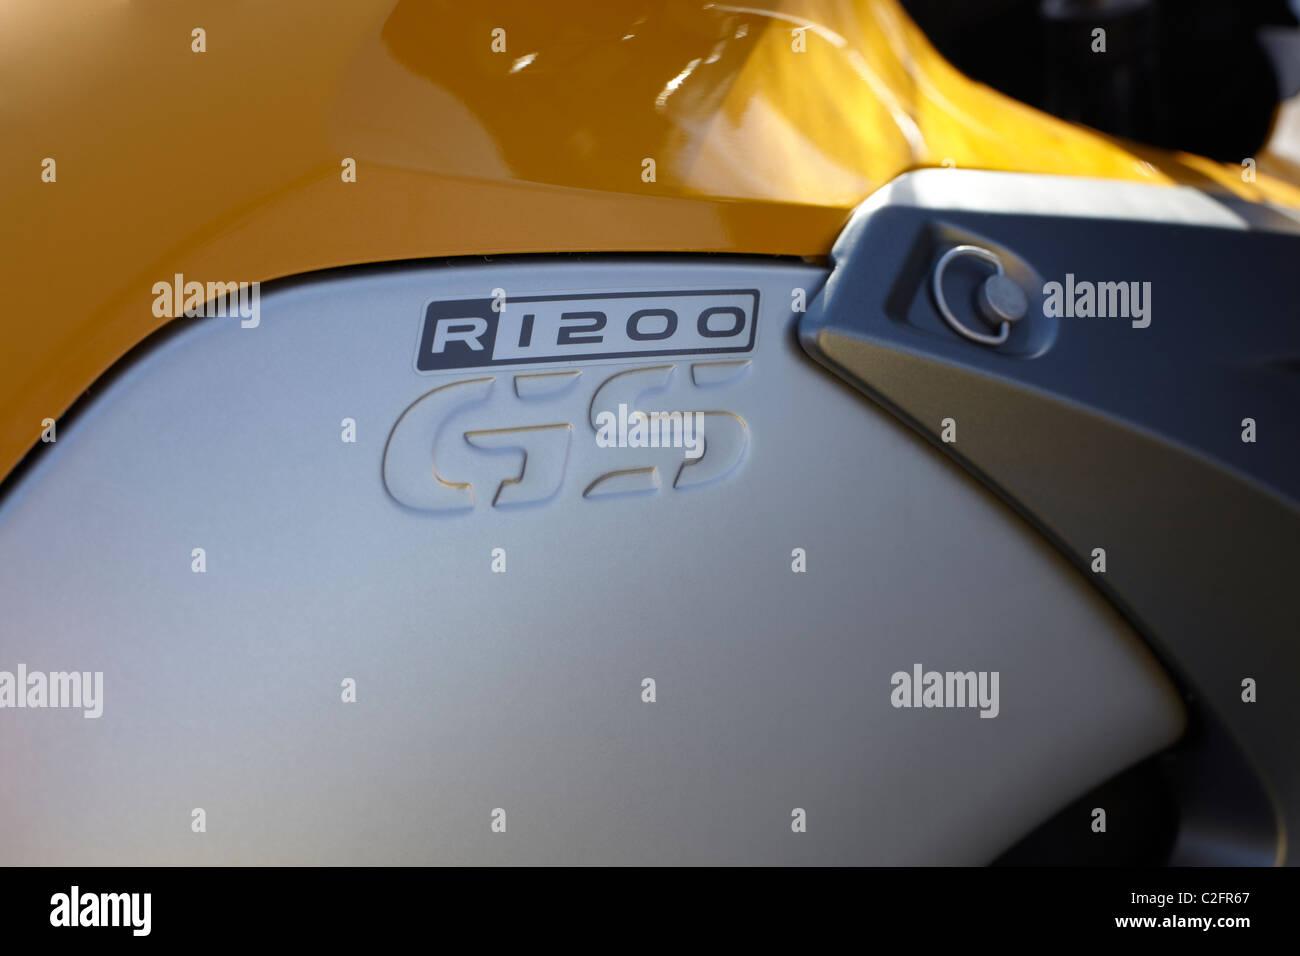 BMW R1200gs side tank detail yellow - Stock Image